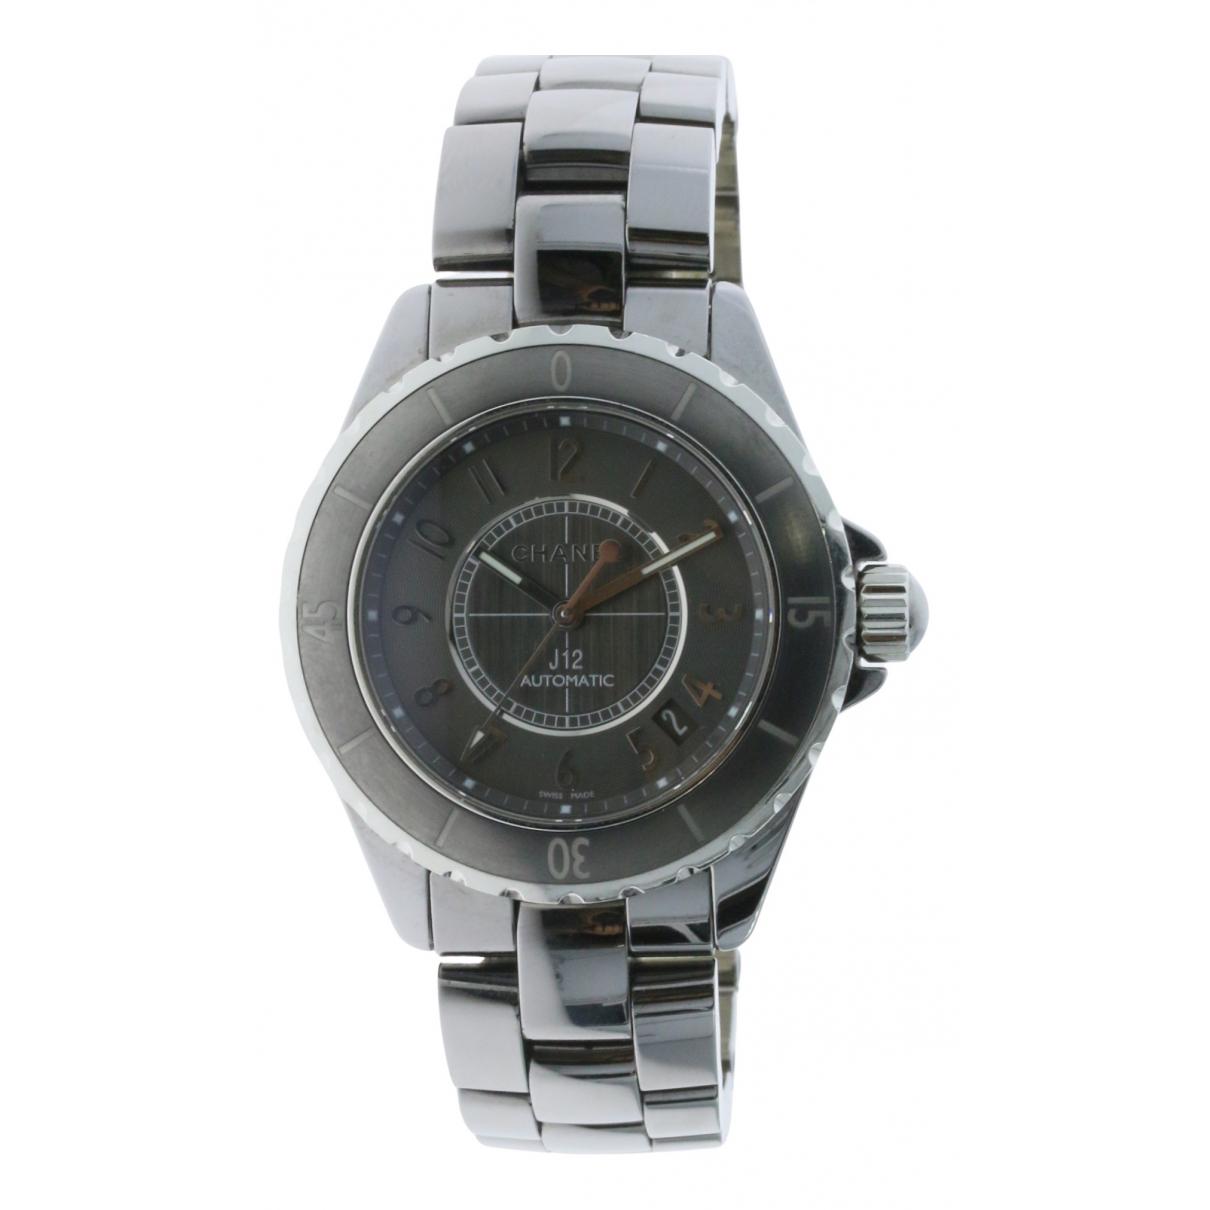 Chanel J12 Automatique Grey Ceramic watch for Men N